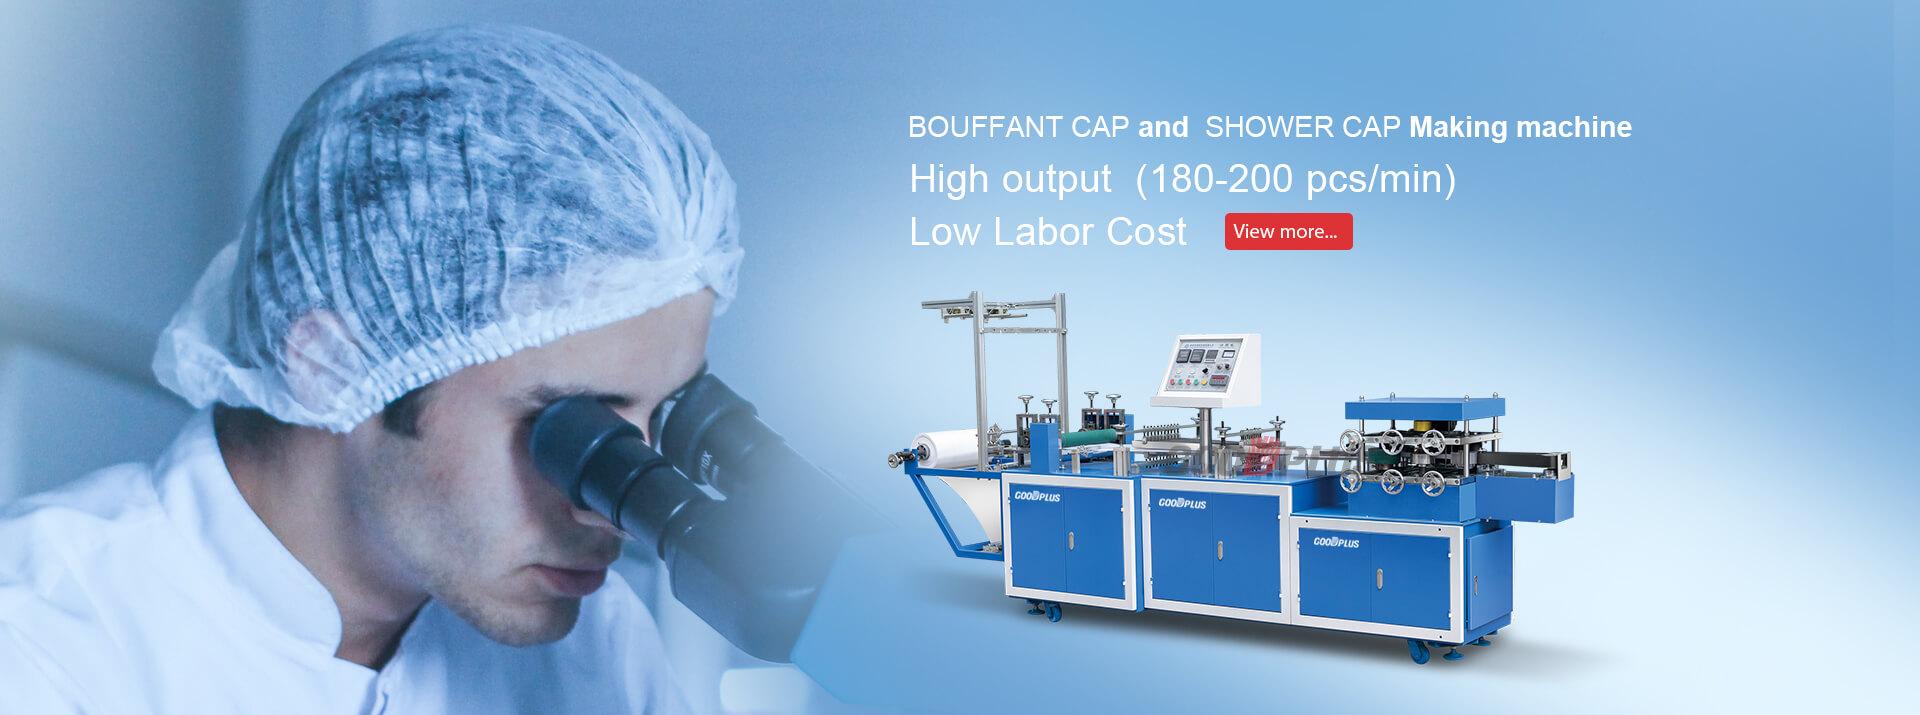 SURGICAL CAP SHOWER CAP MAKING MACHINE